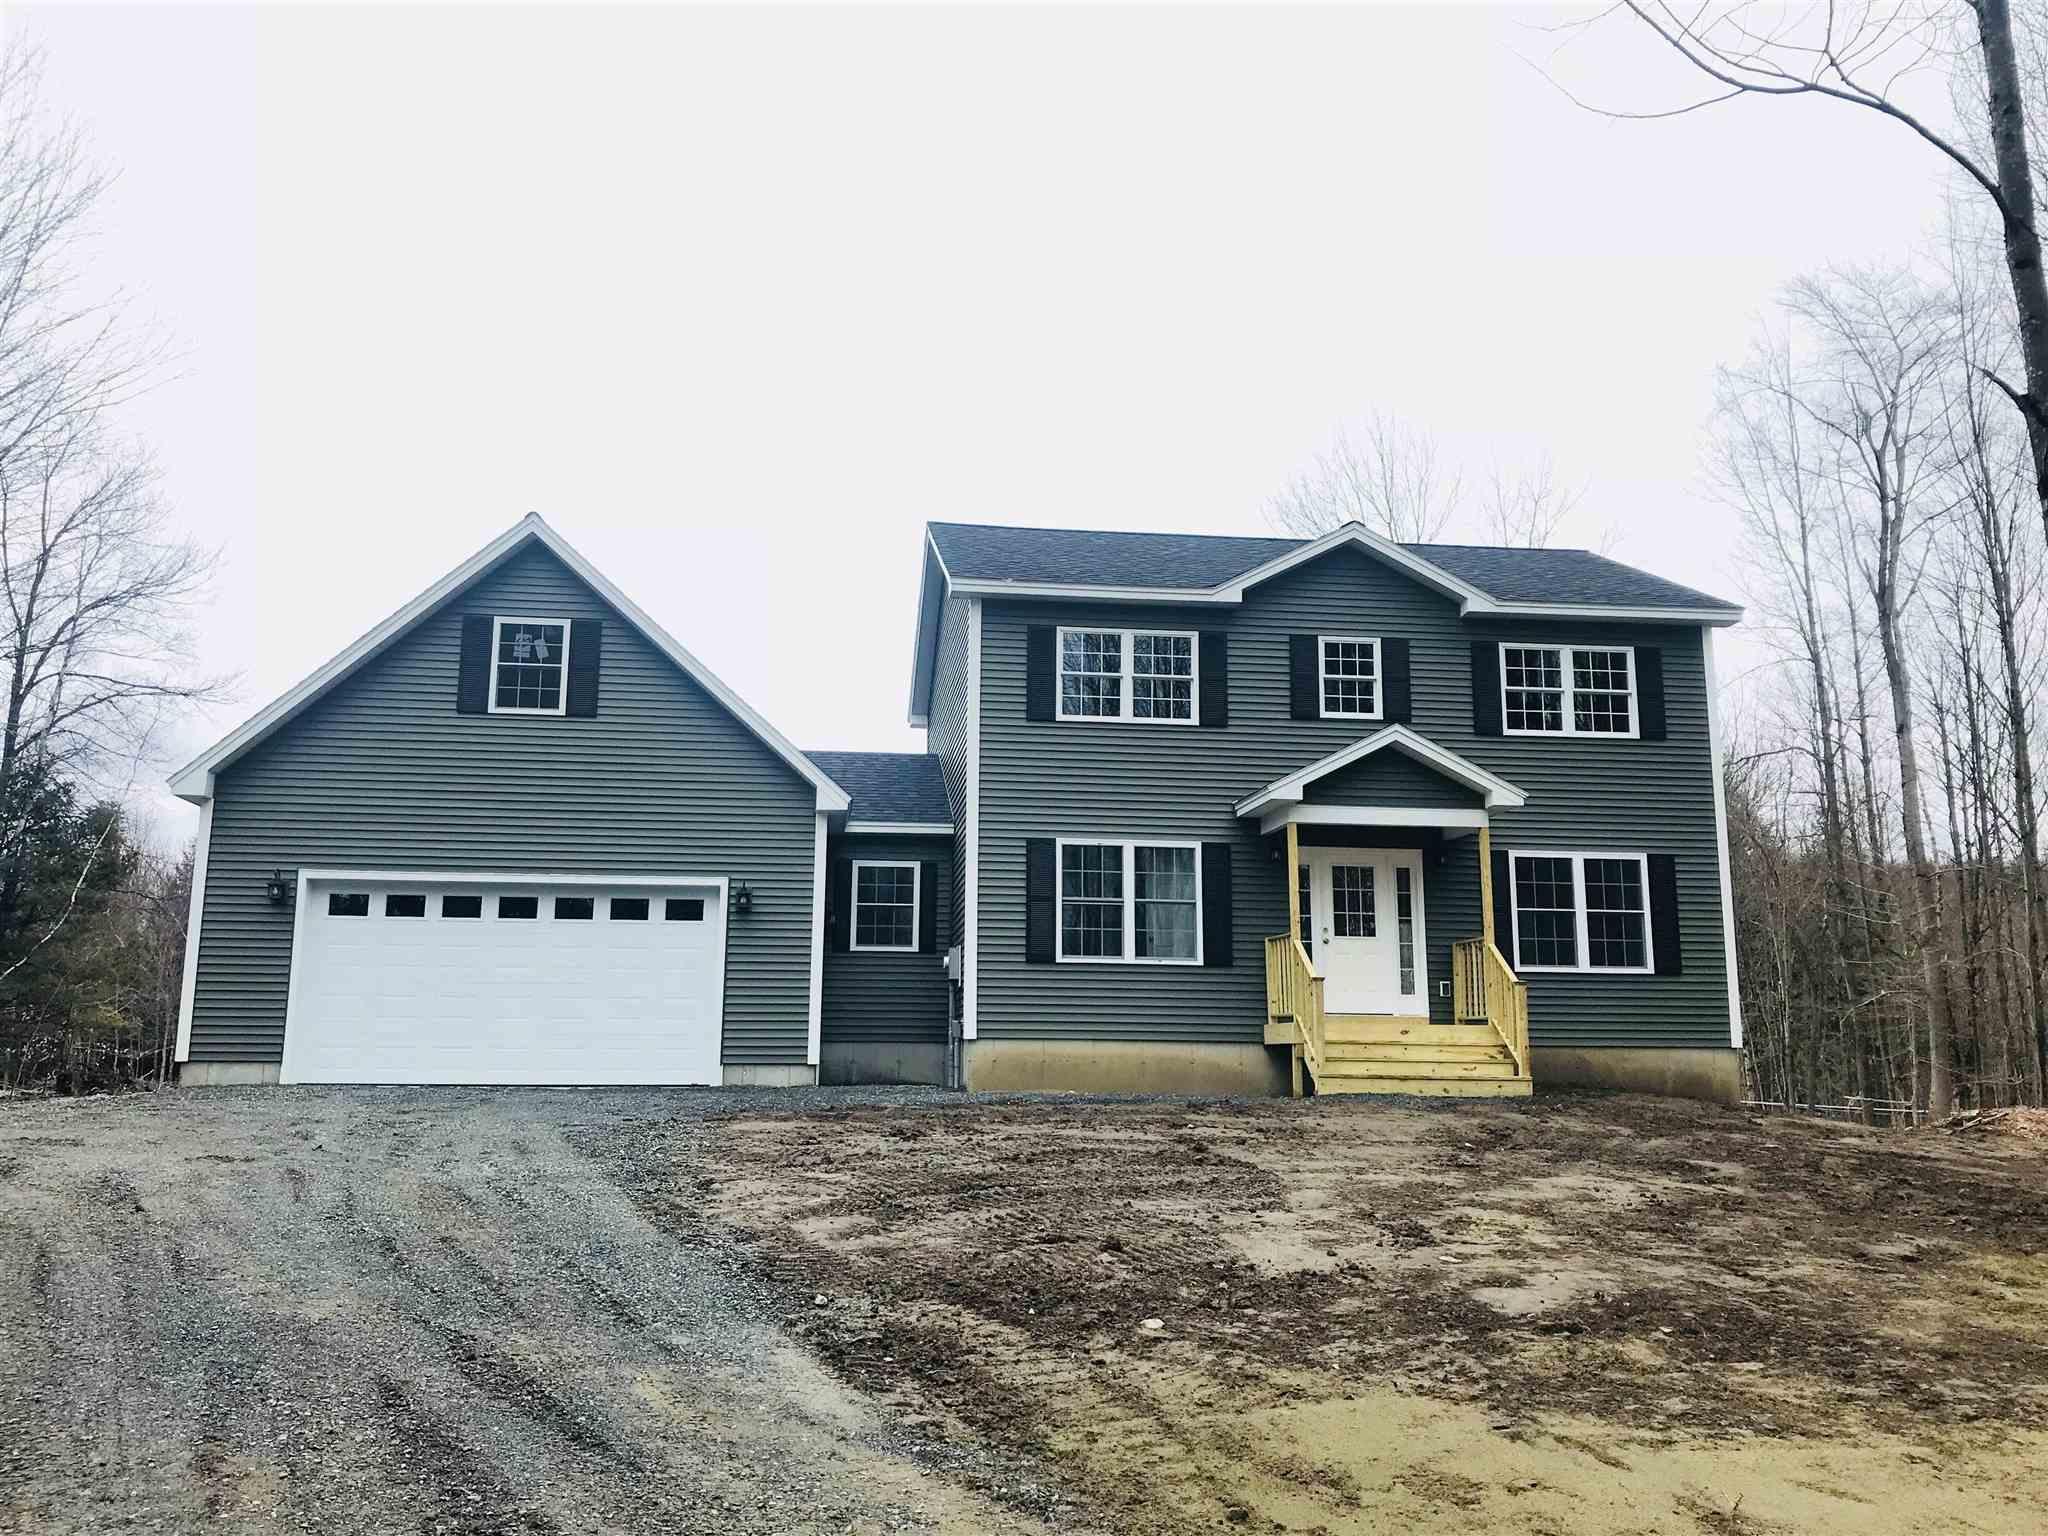 263 Fletcher Road, FAIRFAX, Vermont 05454, 3 Bedrooms Bedrooms, ,3 BathroomsBathrooms,Single Family,For Sale,263 Fletcher Road,2,4851019